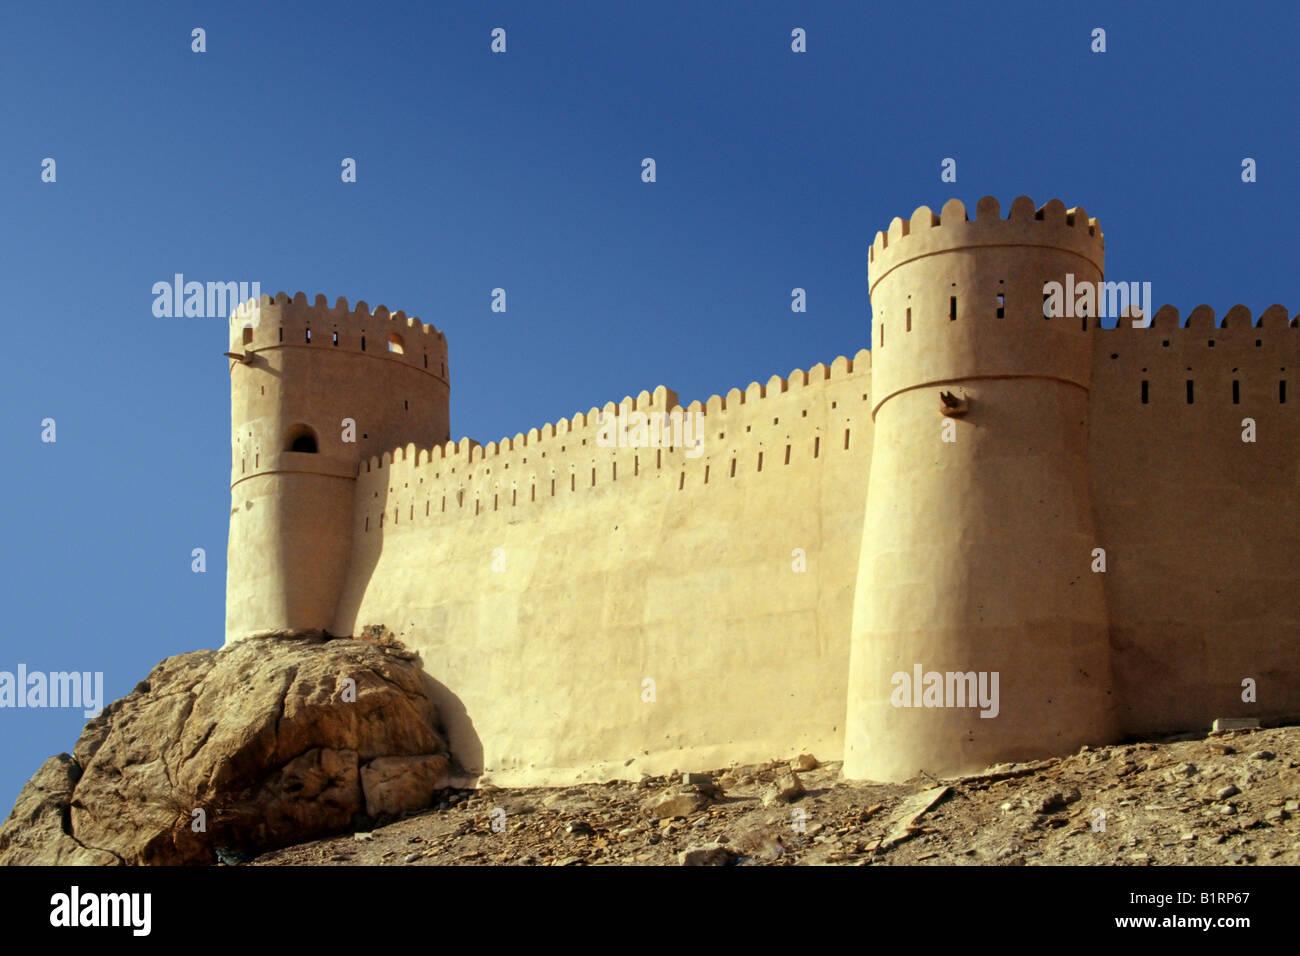 La fortaleza de Nakhl, situado sobre una colina, Omán, Arabia, la Península Árabe, Asia Central, Imagen De Stock